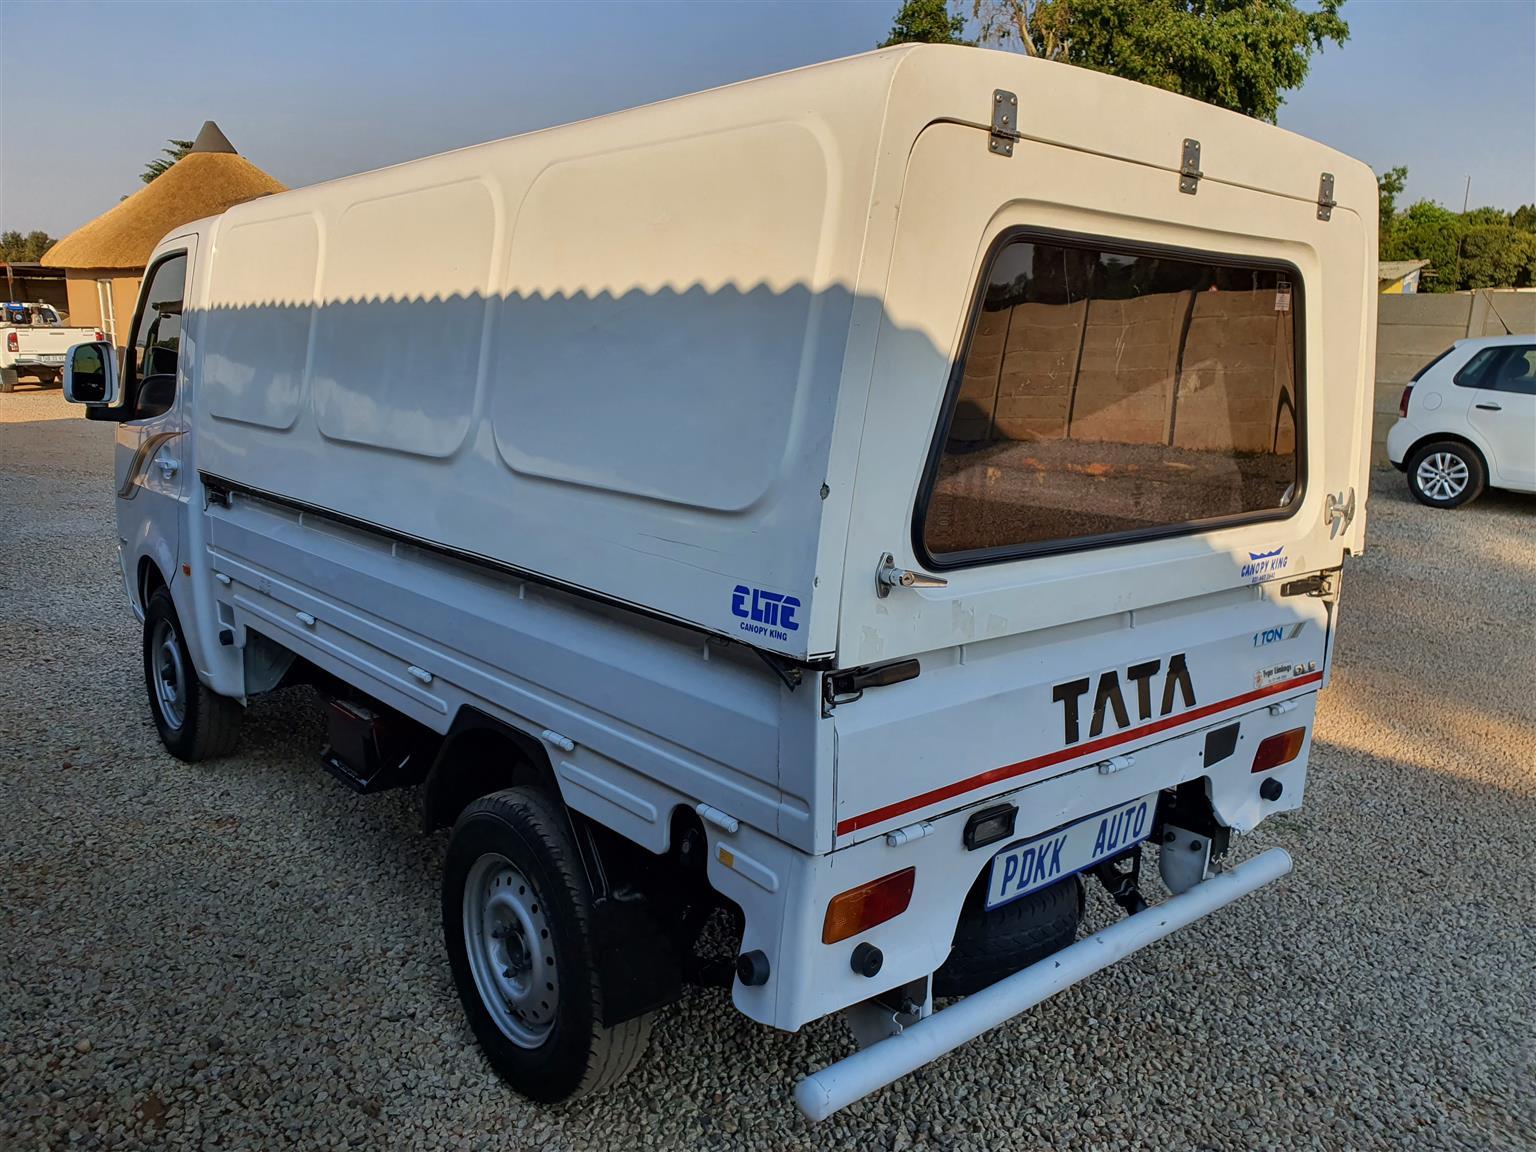 2016 Tata Super ace 1.4 TCIC (turbo diesel)